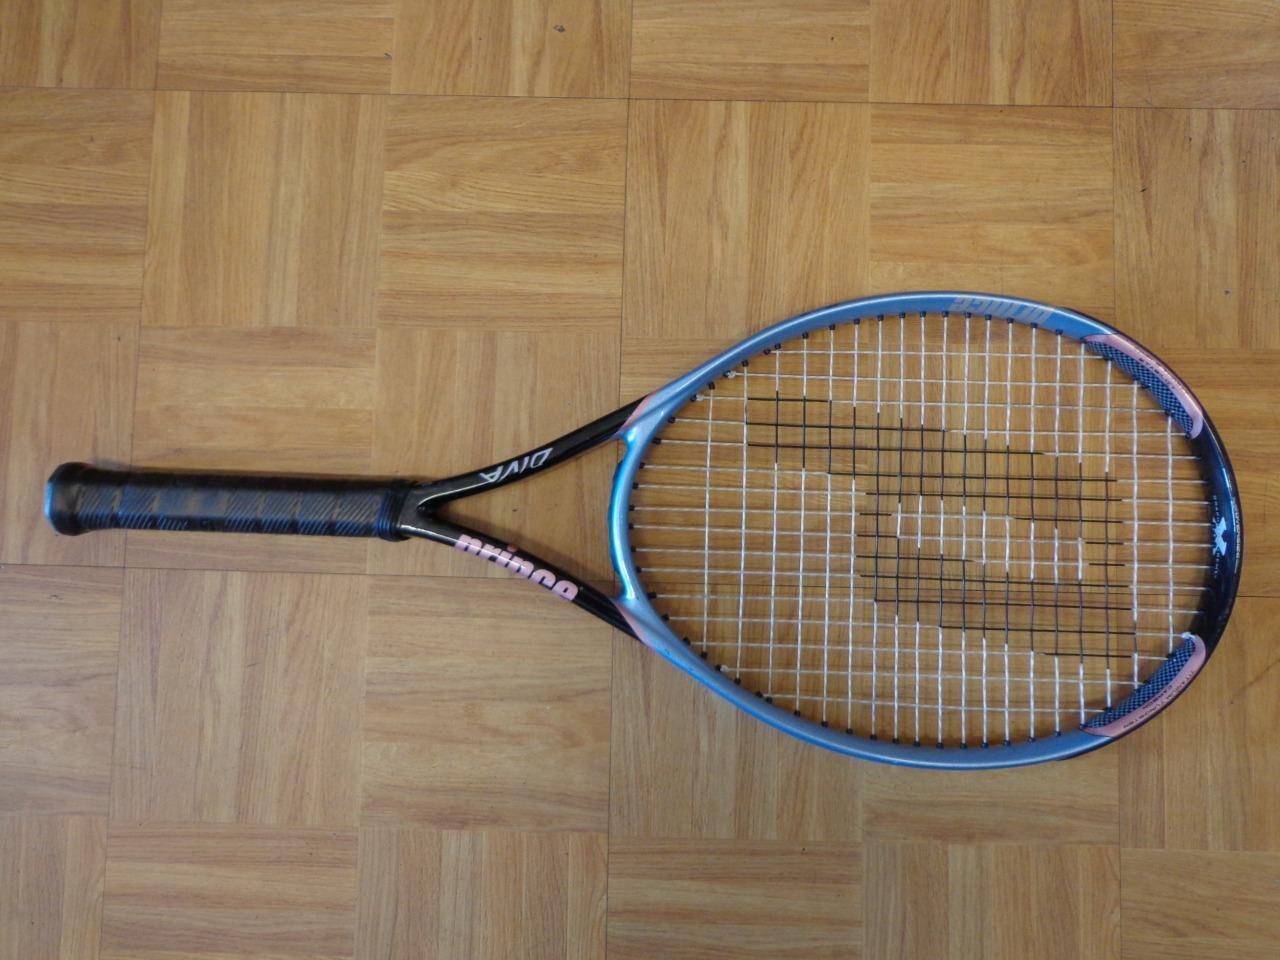 Prince Diva 110 Head 4 3 8 grip raquette de tennis